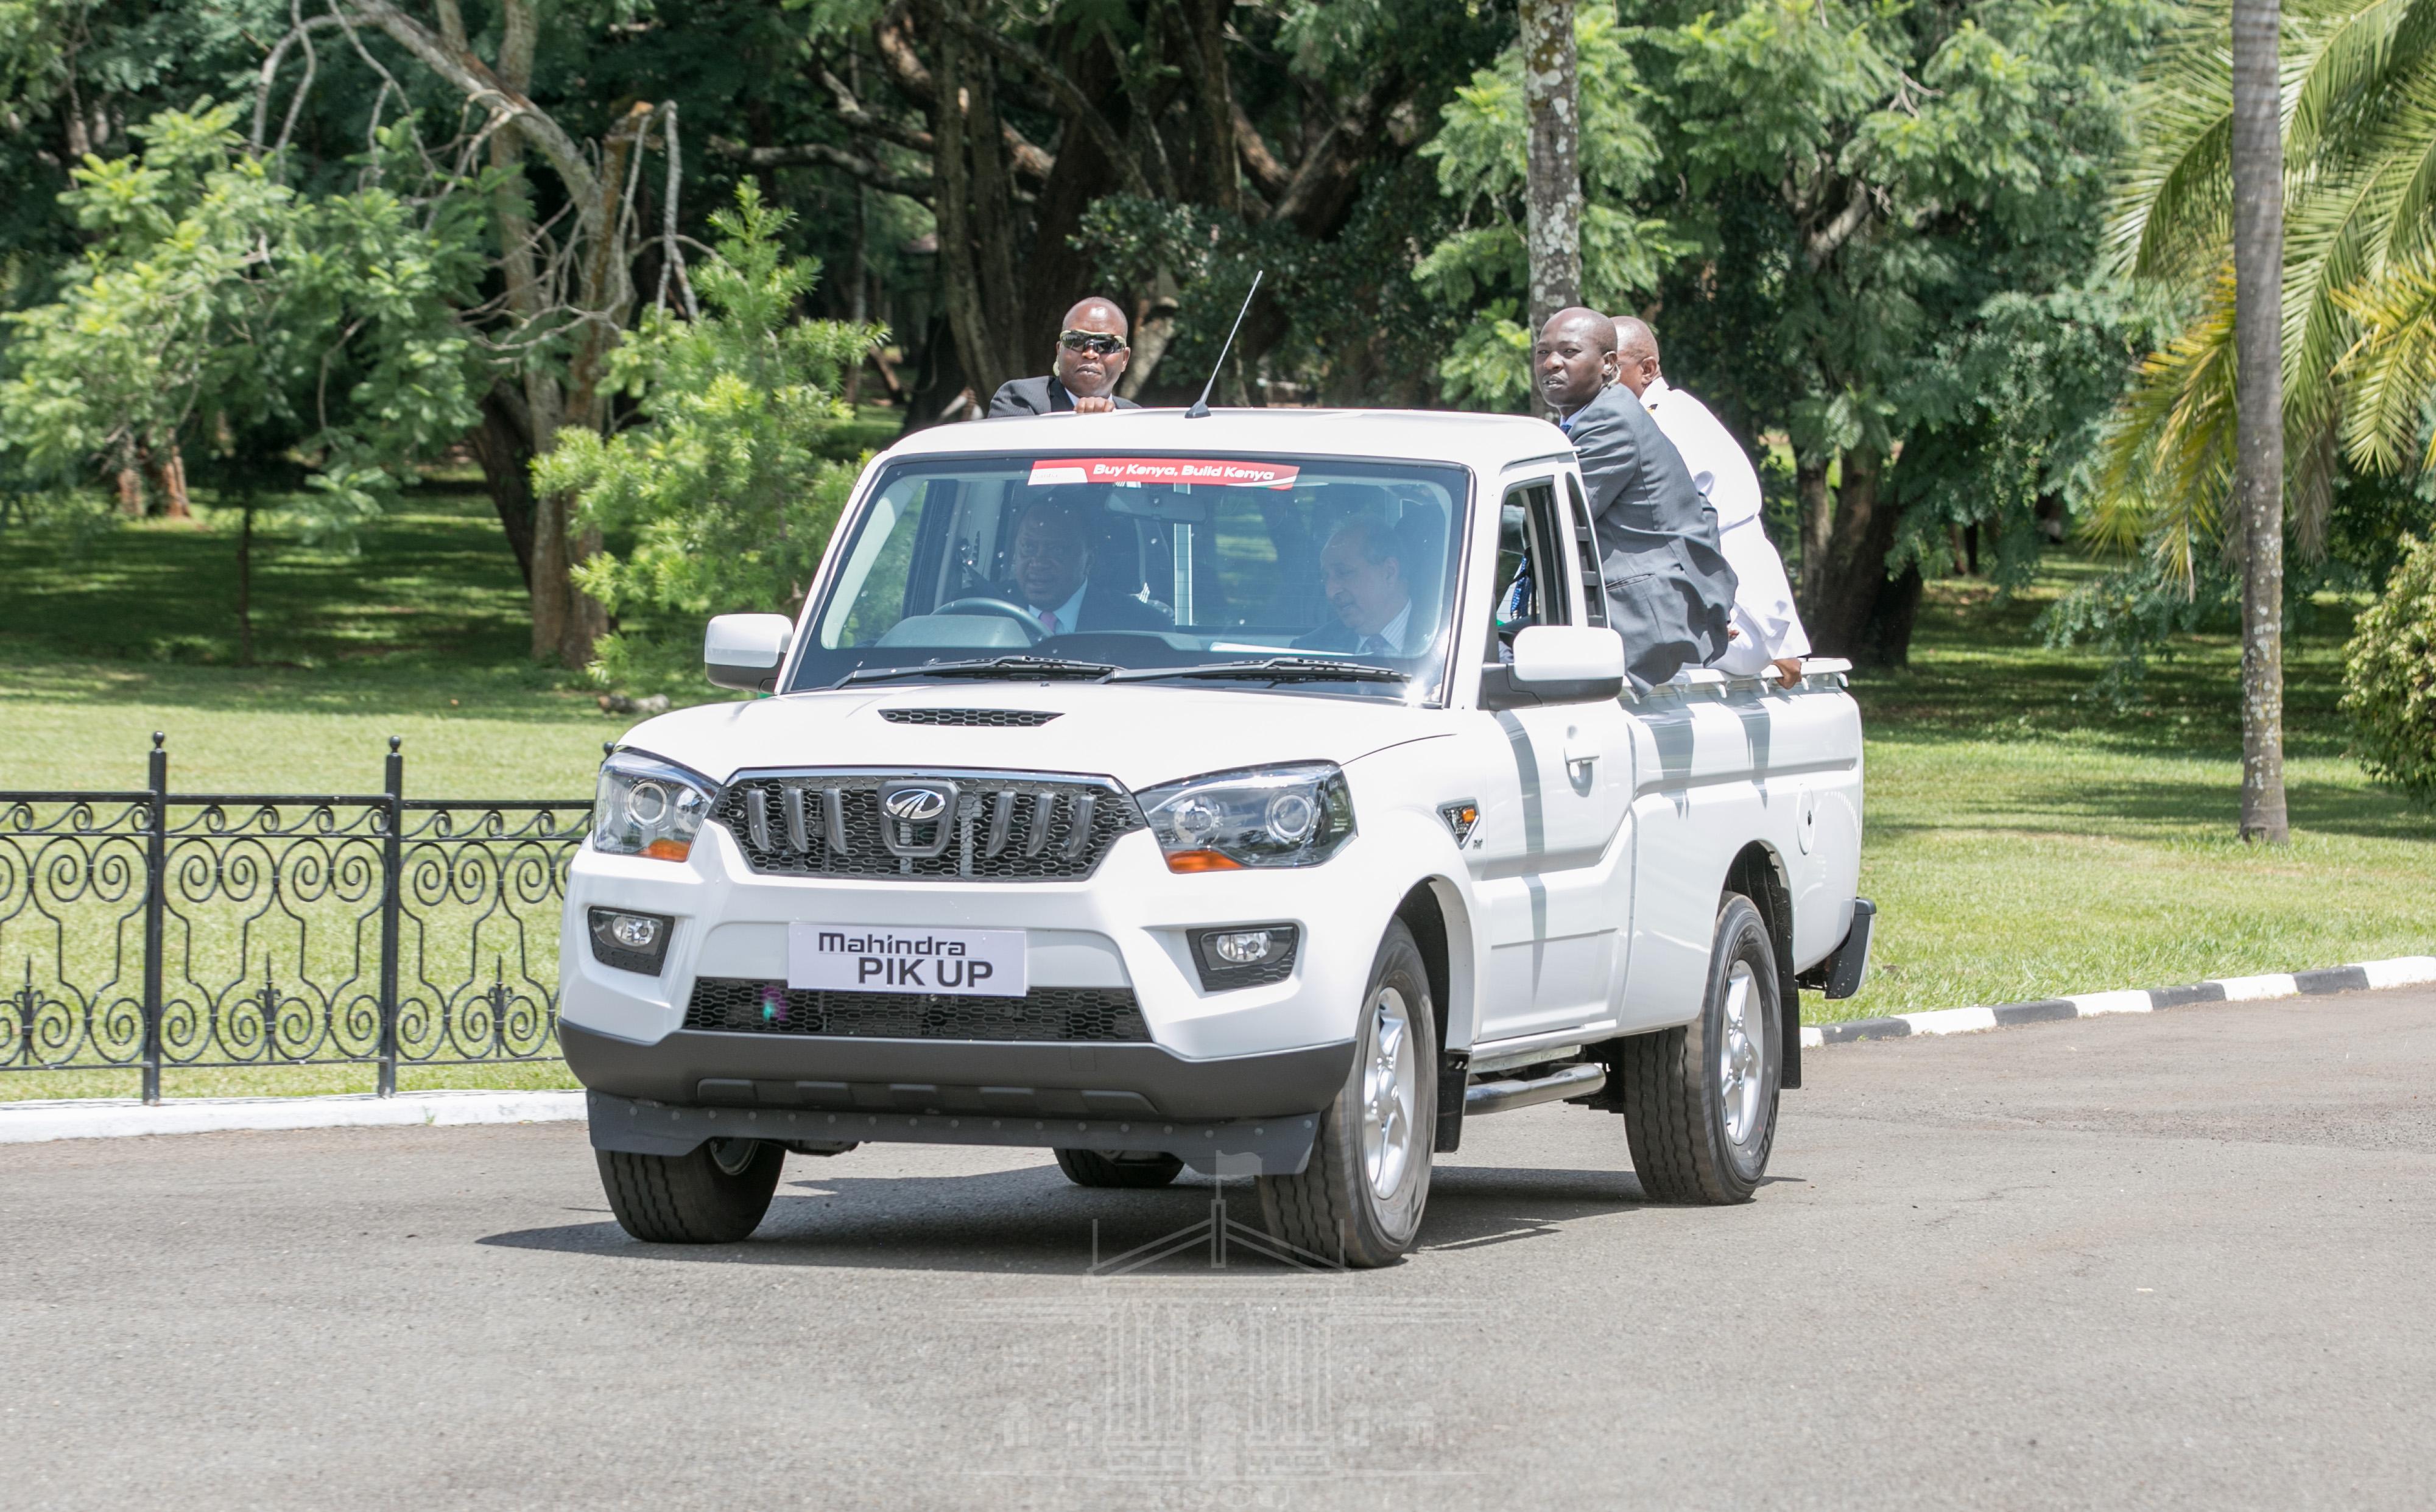 Uhuru unveils first locally assembled Mahindra vehicles